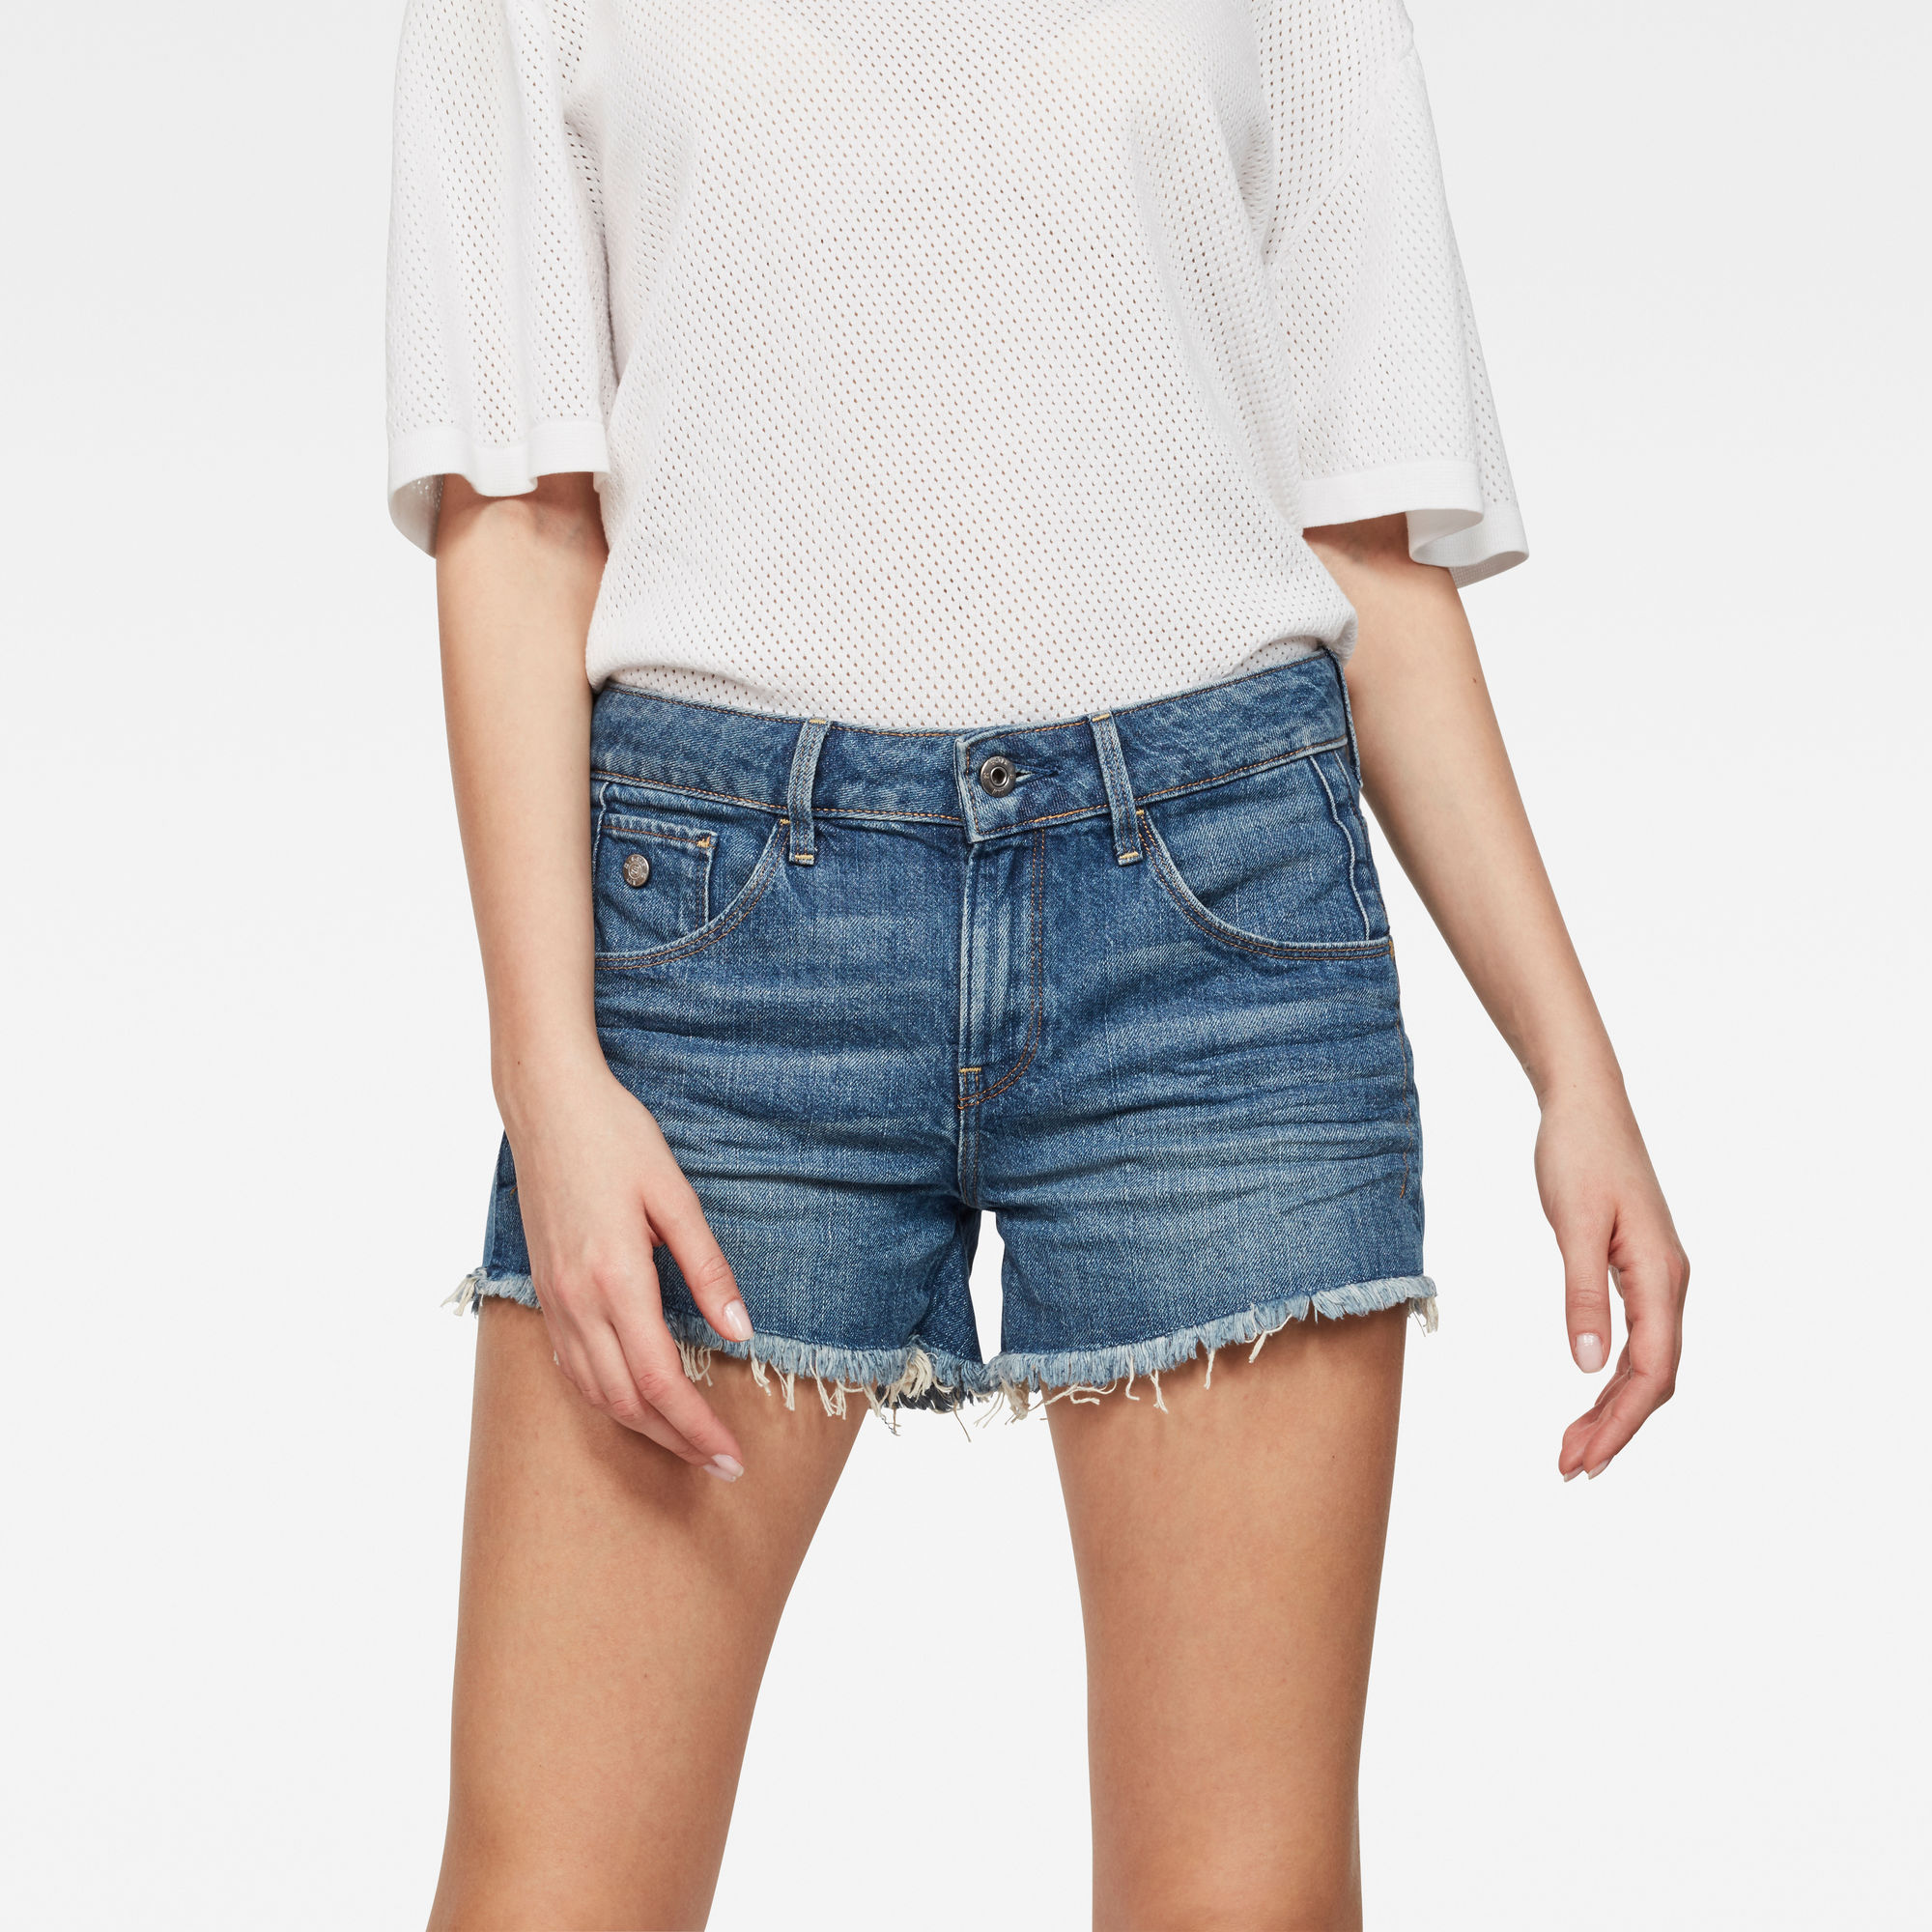 Arc Mid waist Ripped Shorts